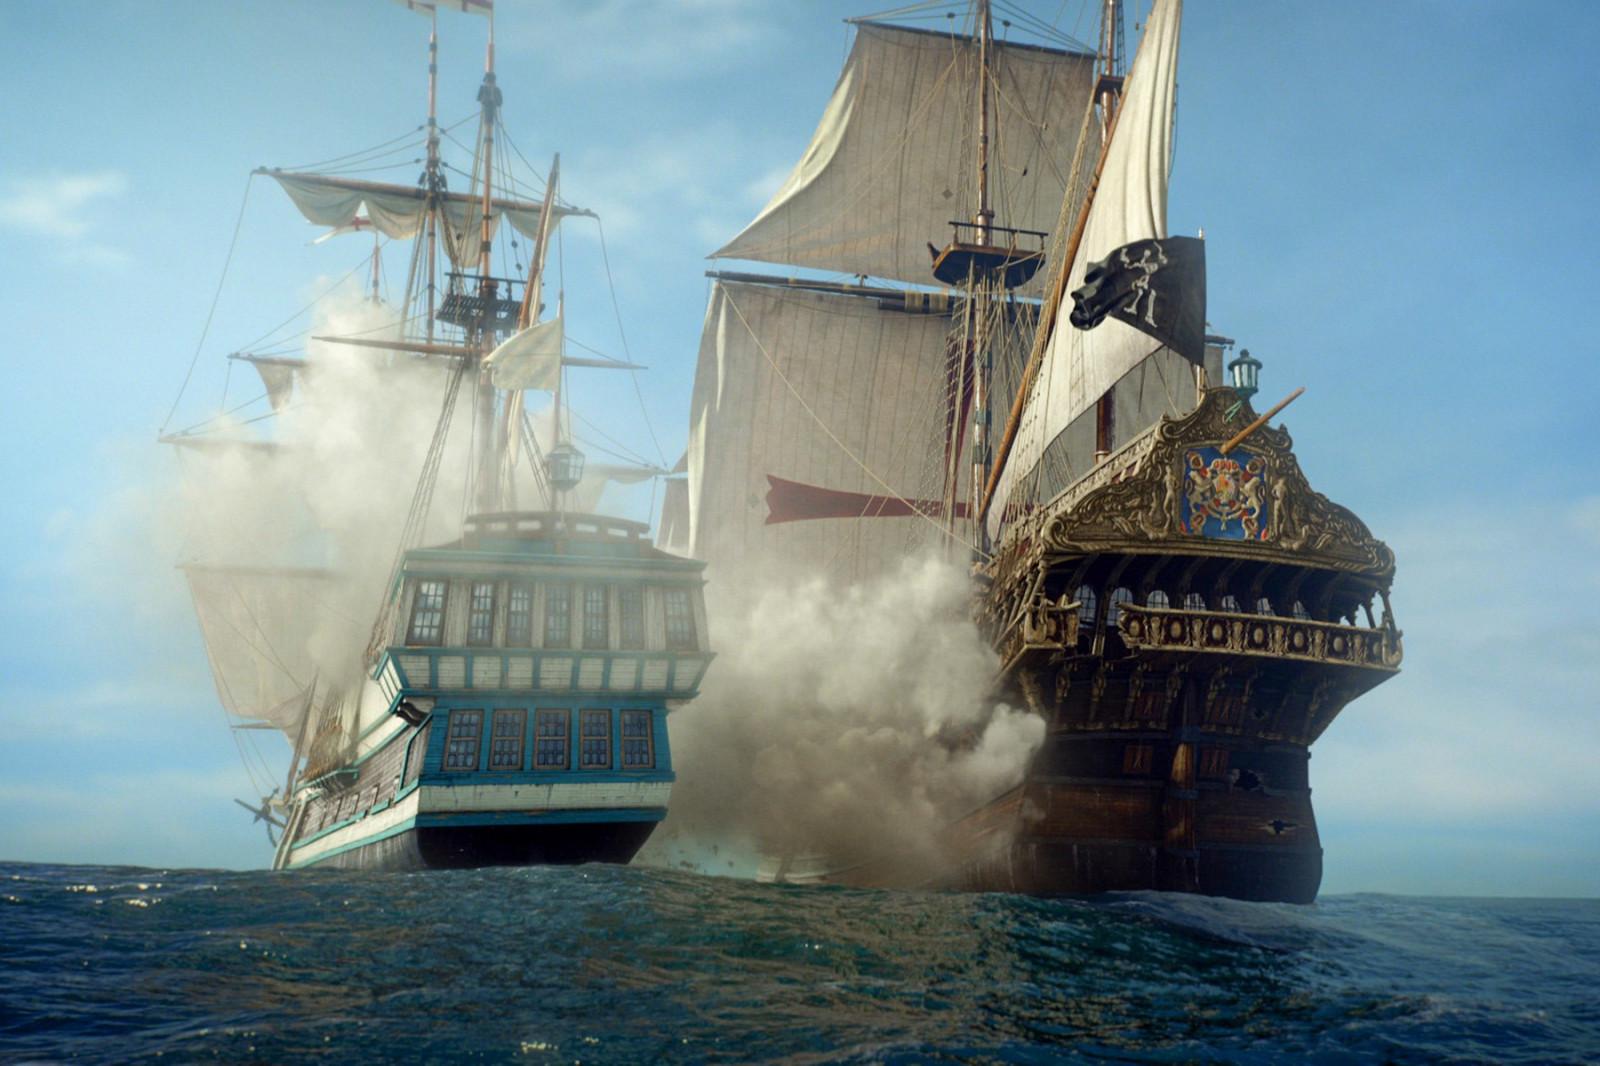 Fond d 39 cran bateau voile mer v hicule voiles - Voile bateau pirate ...